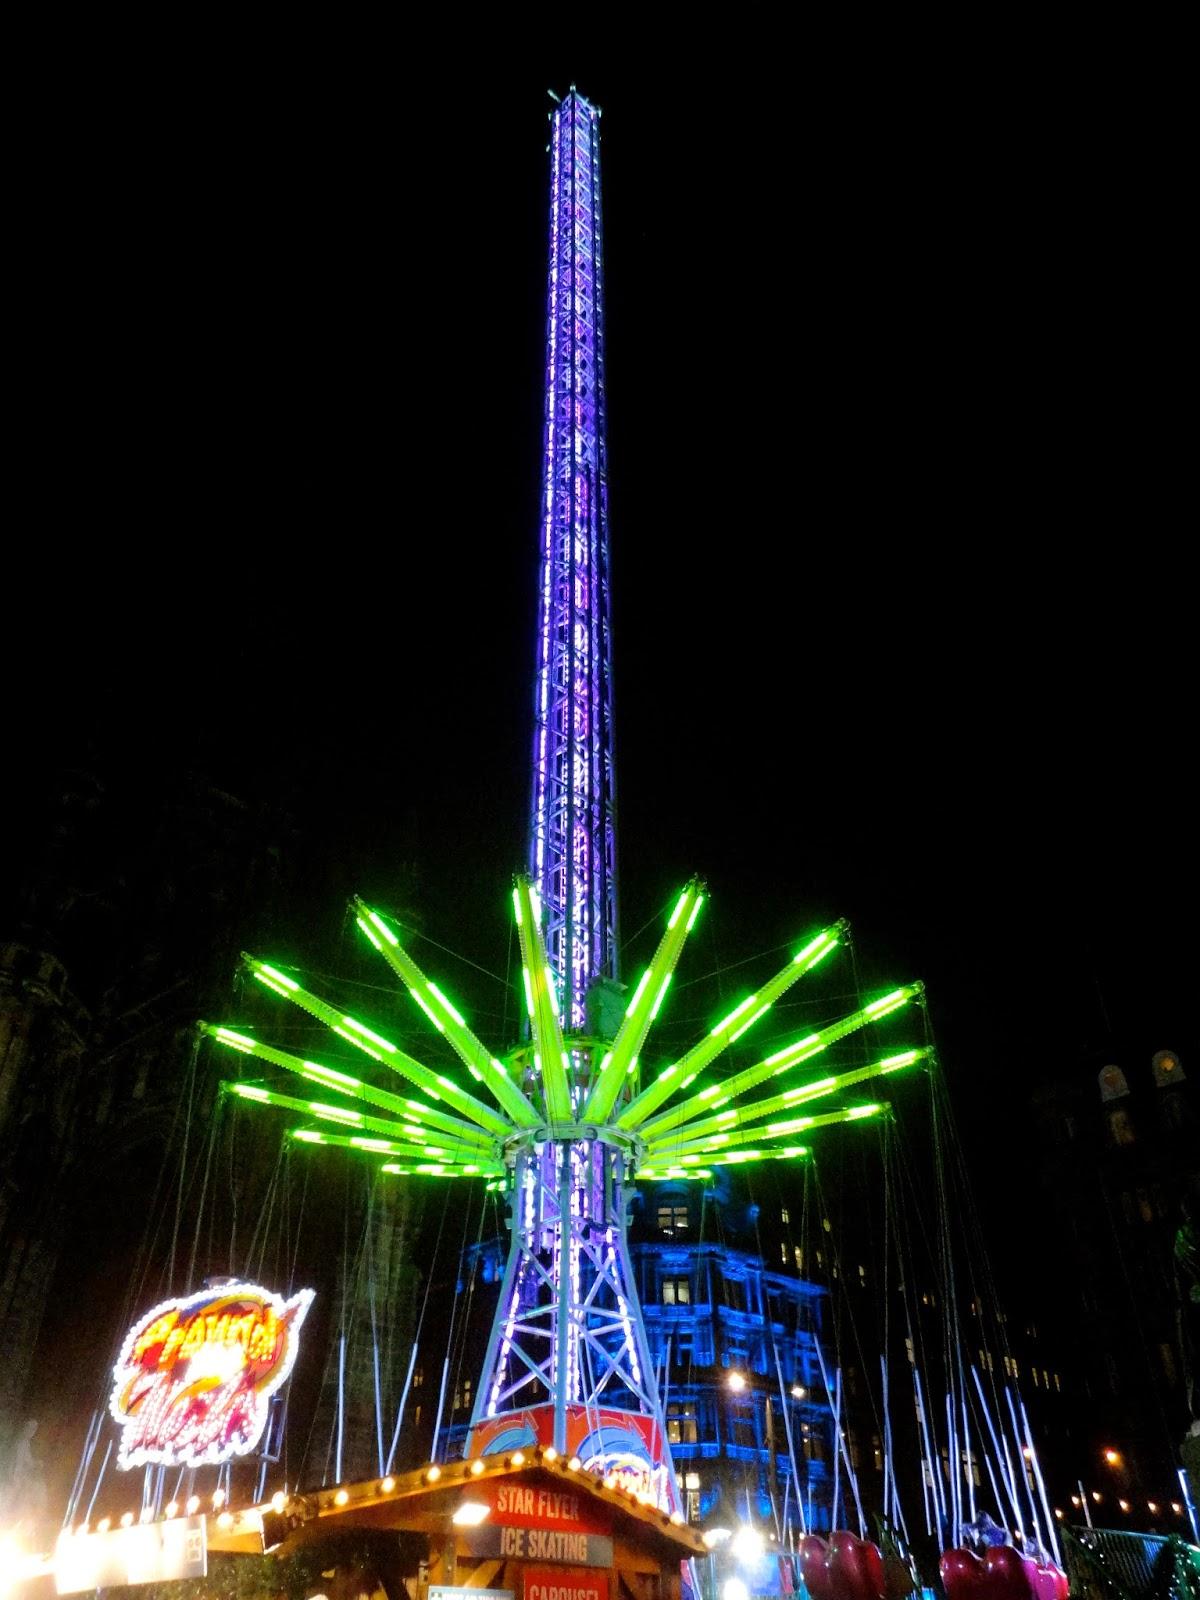 Giant tower of spinning swings in Edinburgh's Winter Wonderland at Christmas in Princes Street Gardens